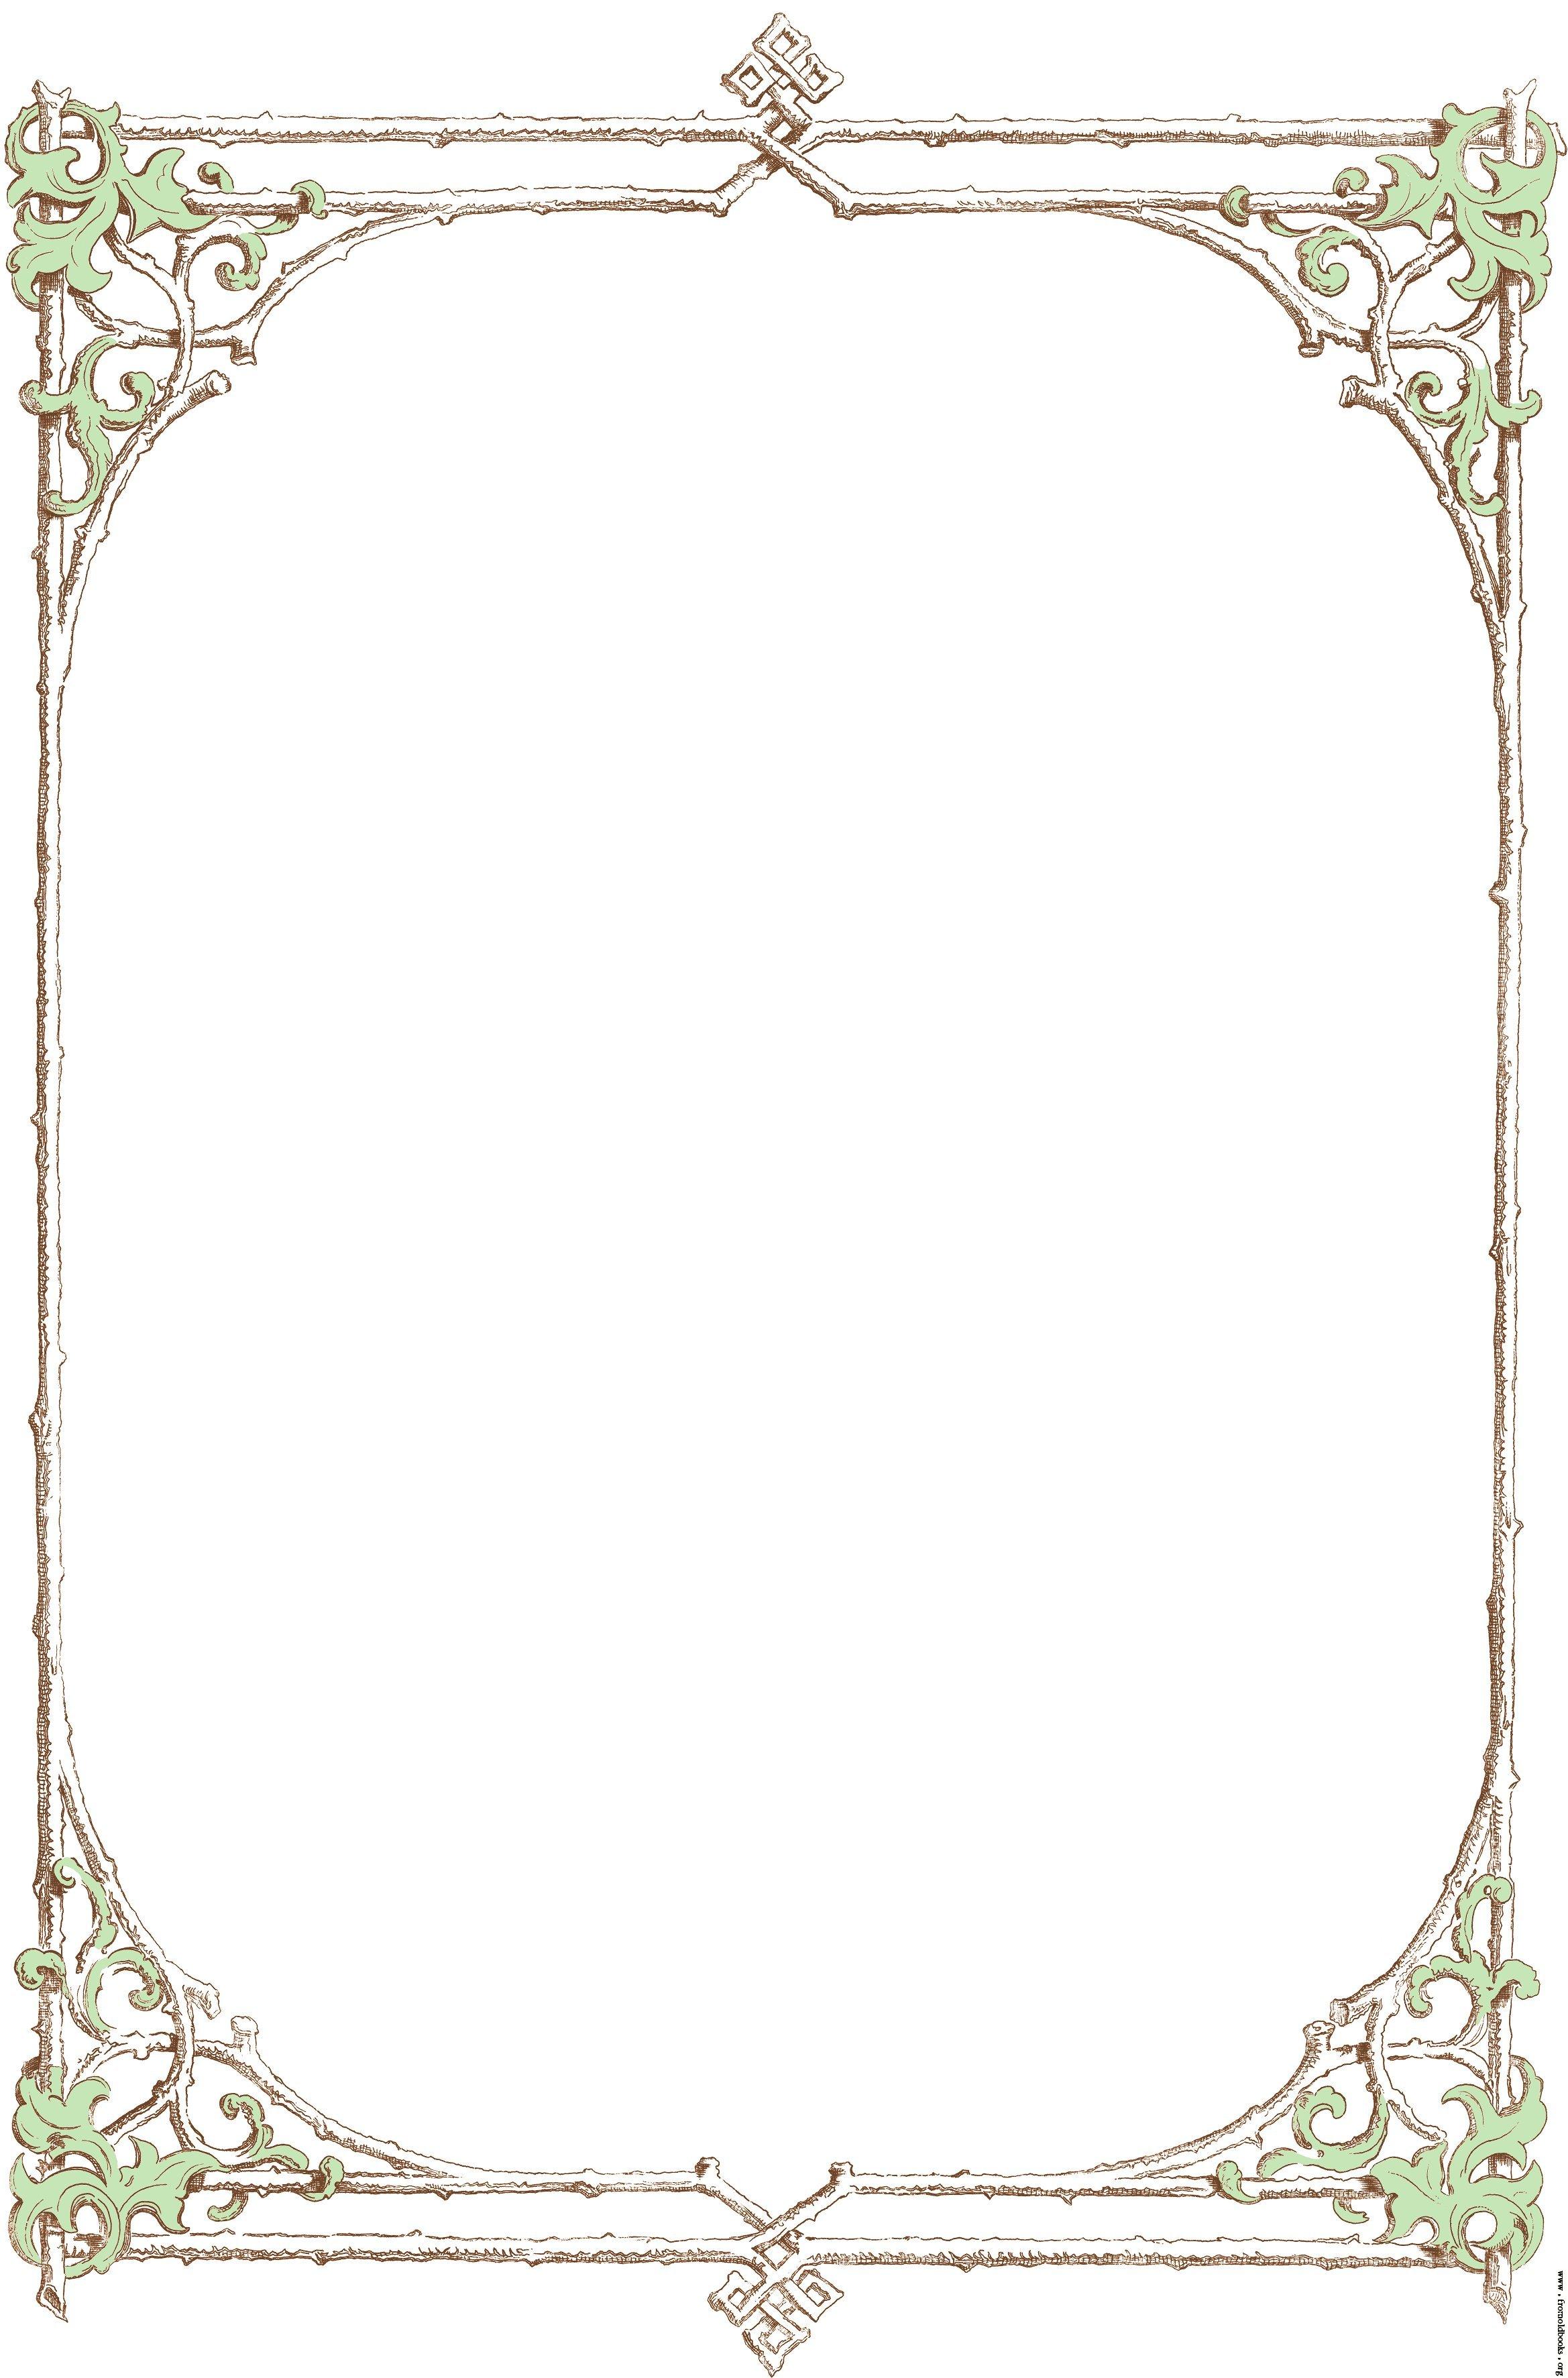 Victorian clipart free decorative picture Free Victorian Frame Cliparts, Download Free Clip Art, Free ... picture